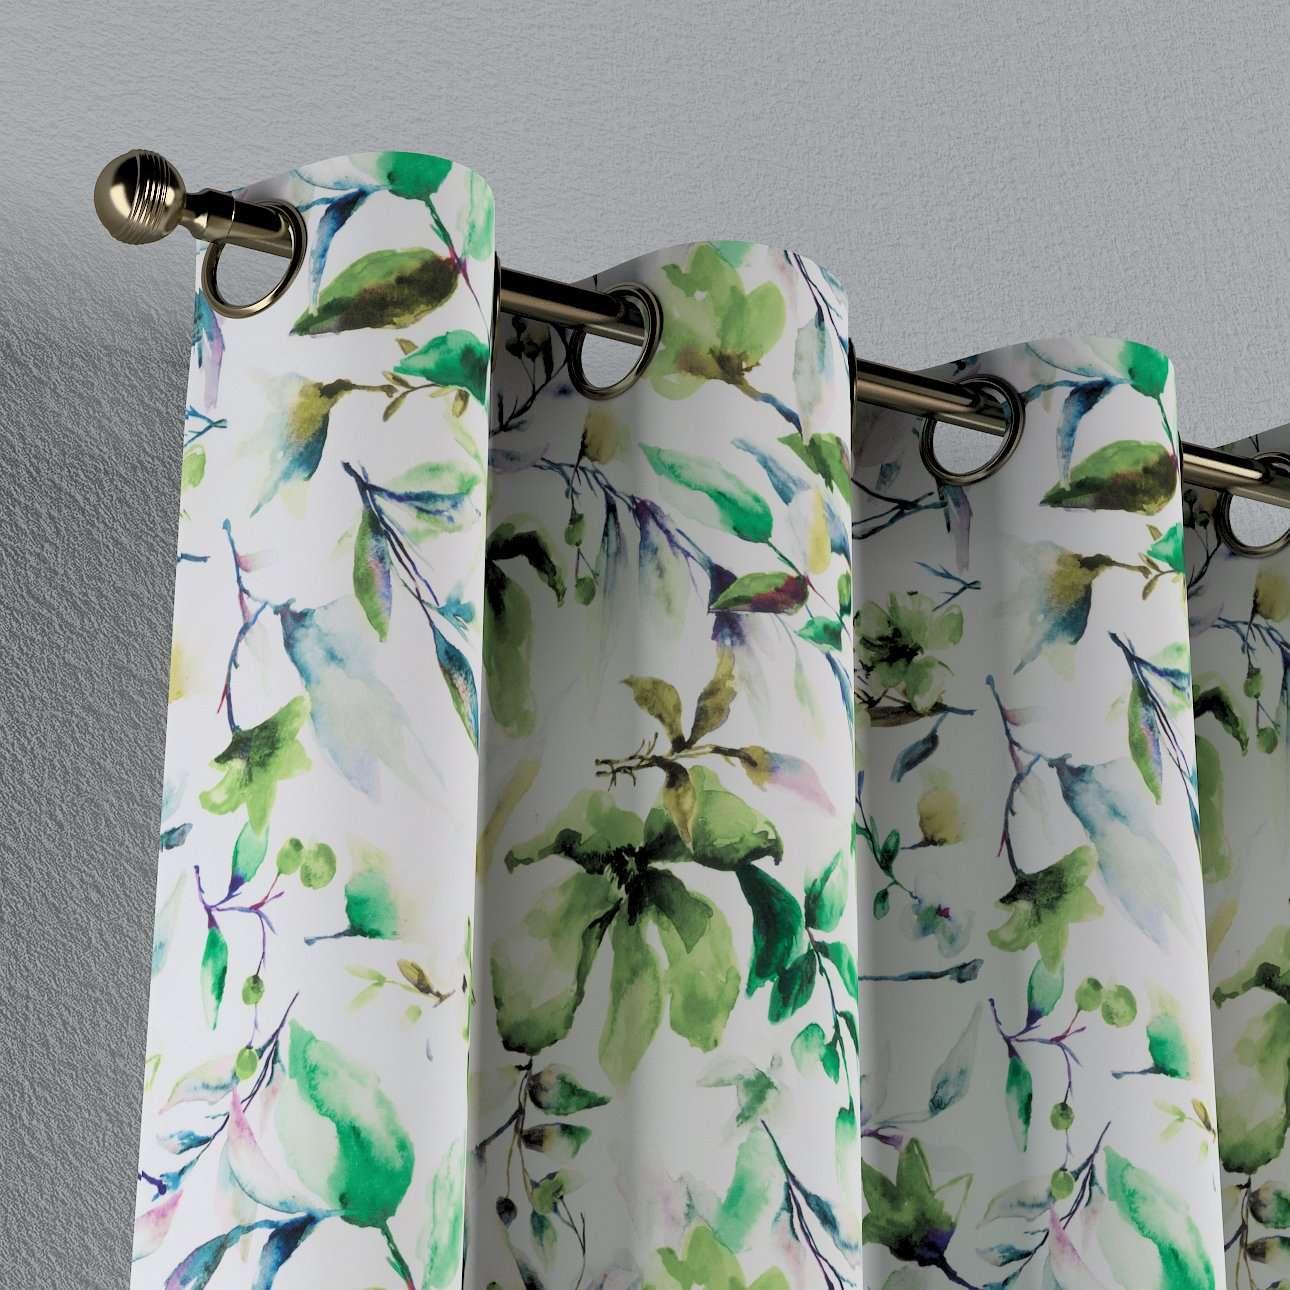 Záves s kolieskami V kolekcii Velvet, tkanina: 704-20